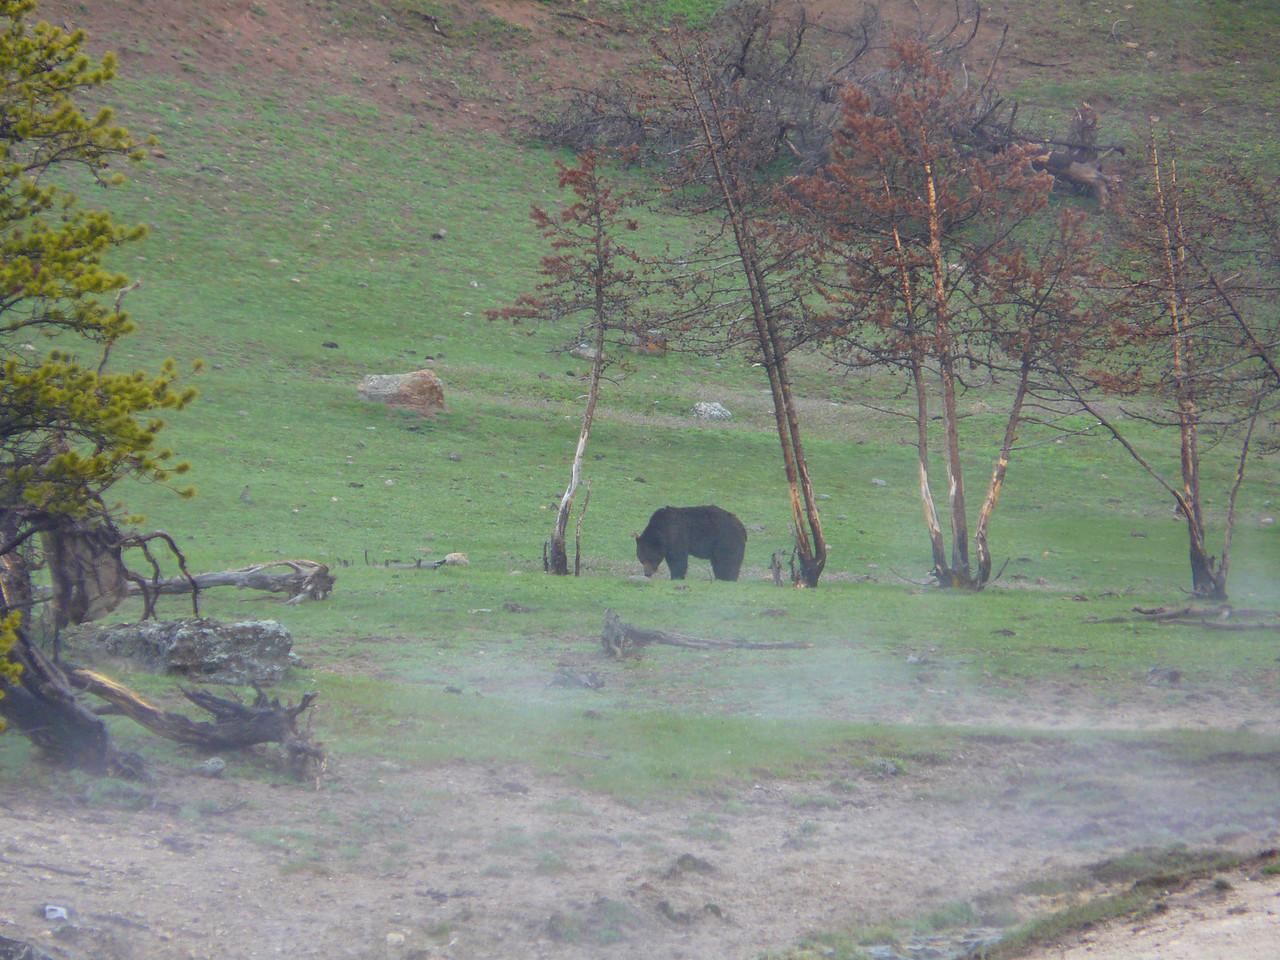 Grizzly Bear near Sedge Bay on Yellowstone Lake